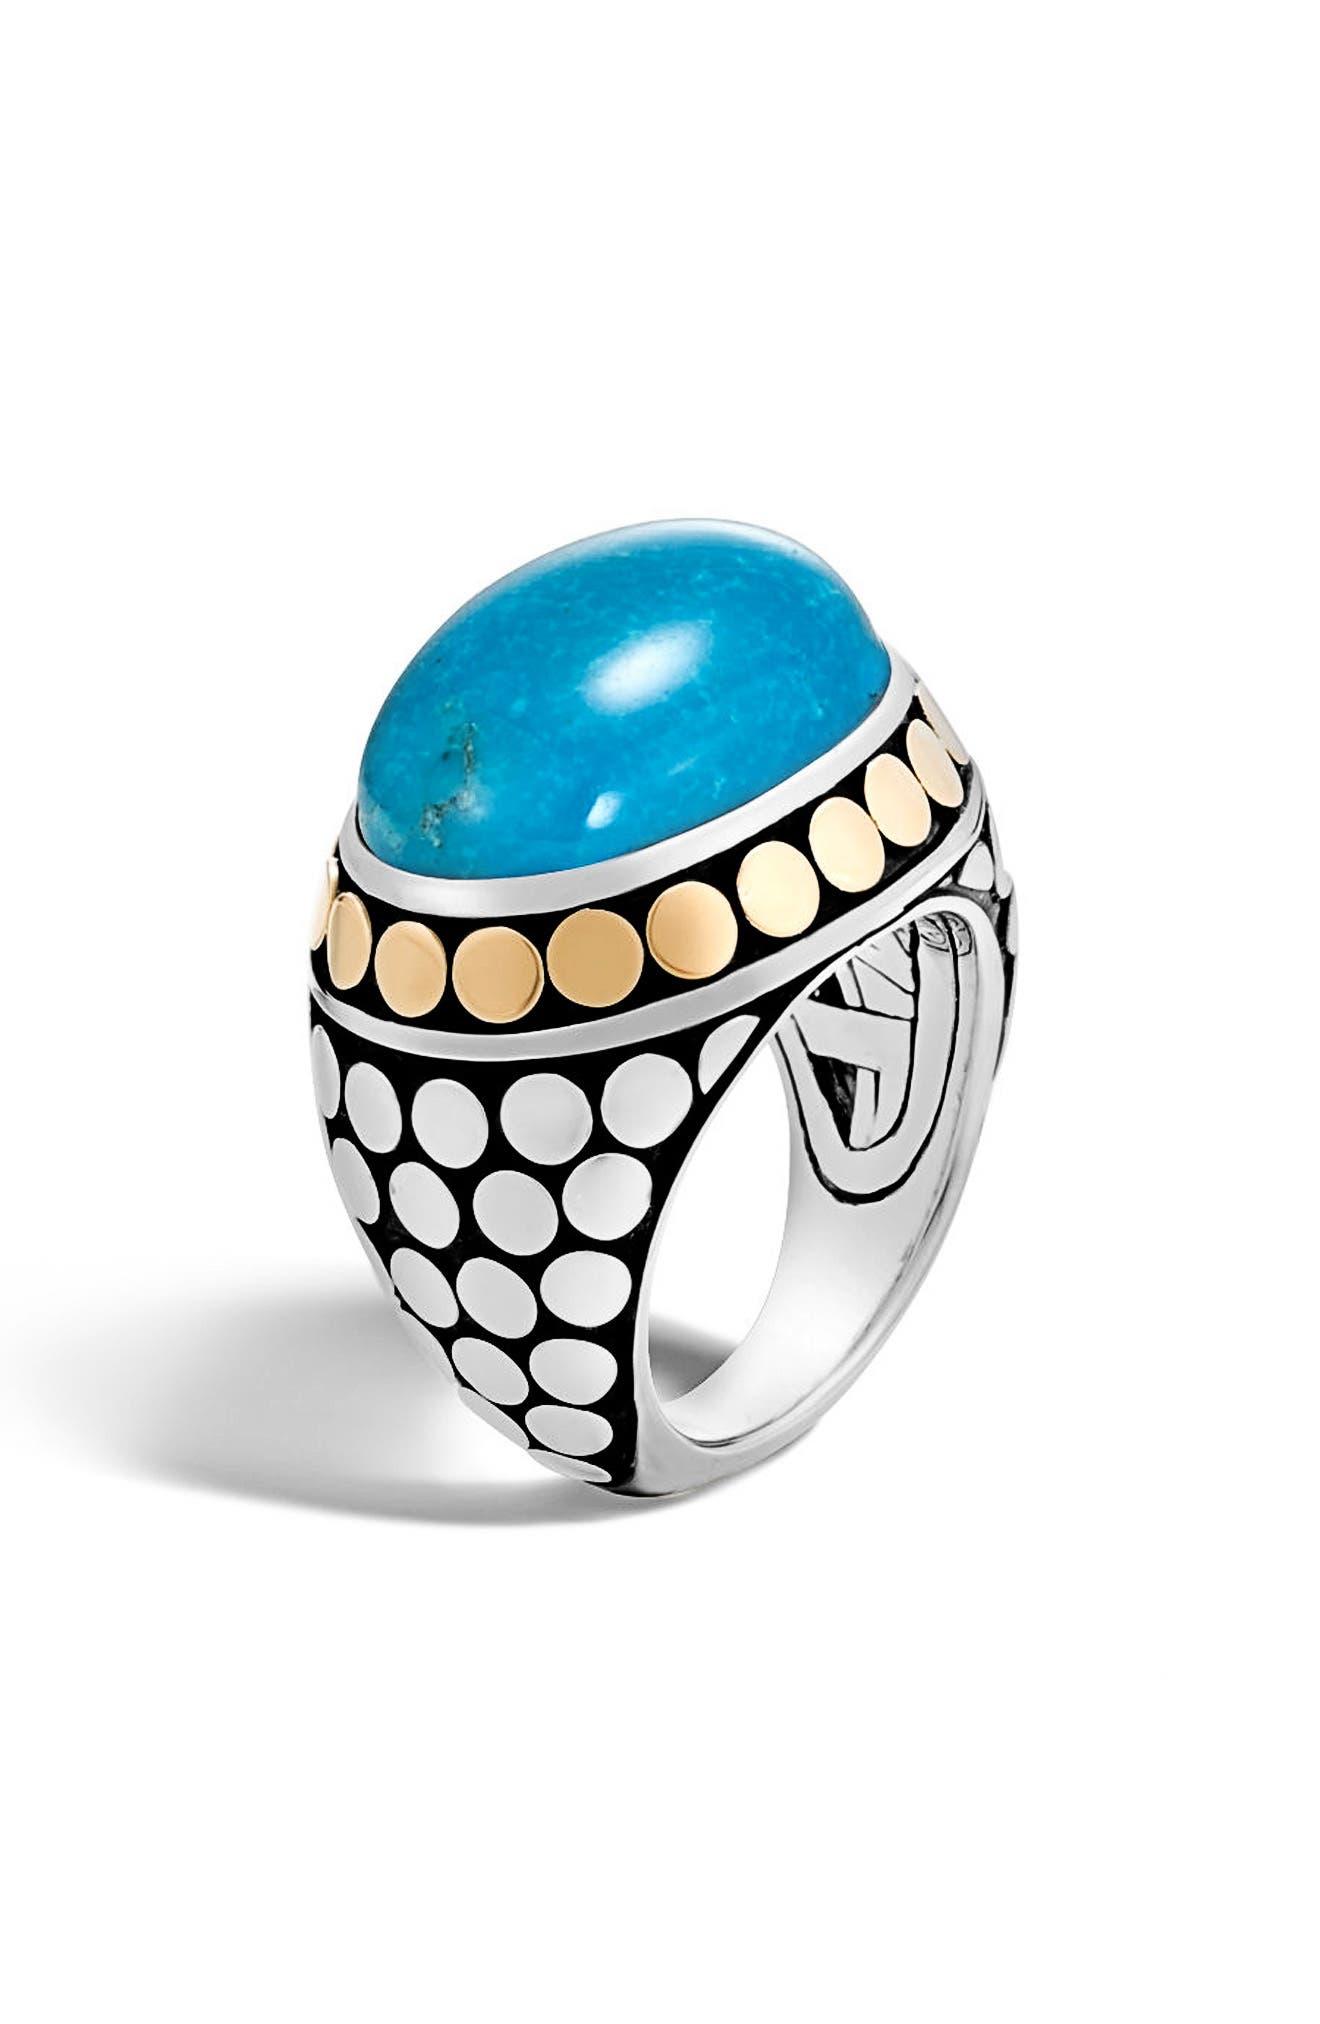 Main Image - John Hardy Dot Silver & Turquoise Dome Ring